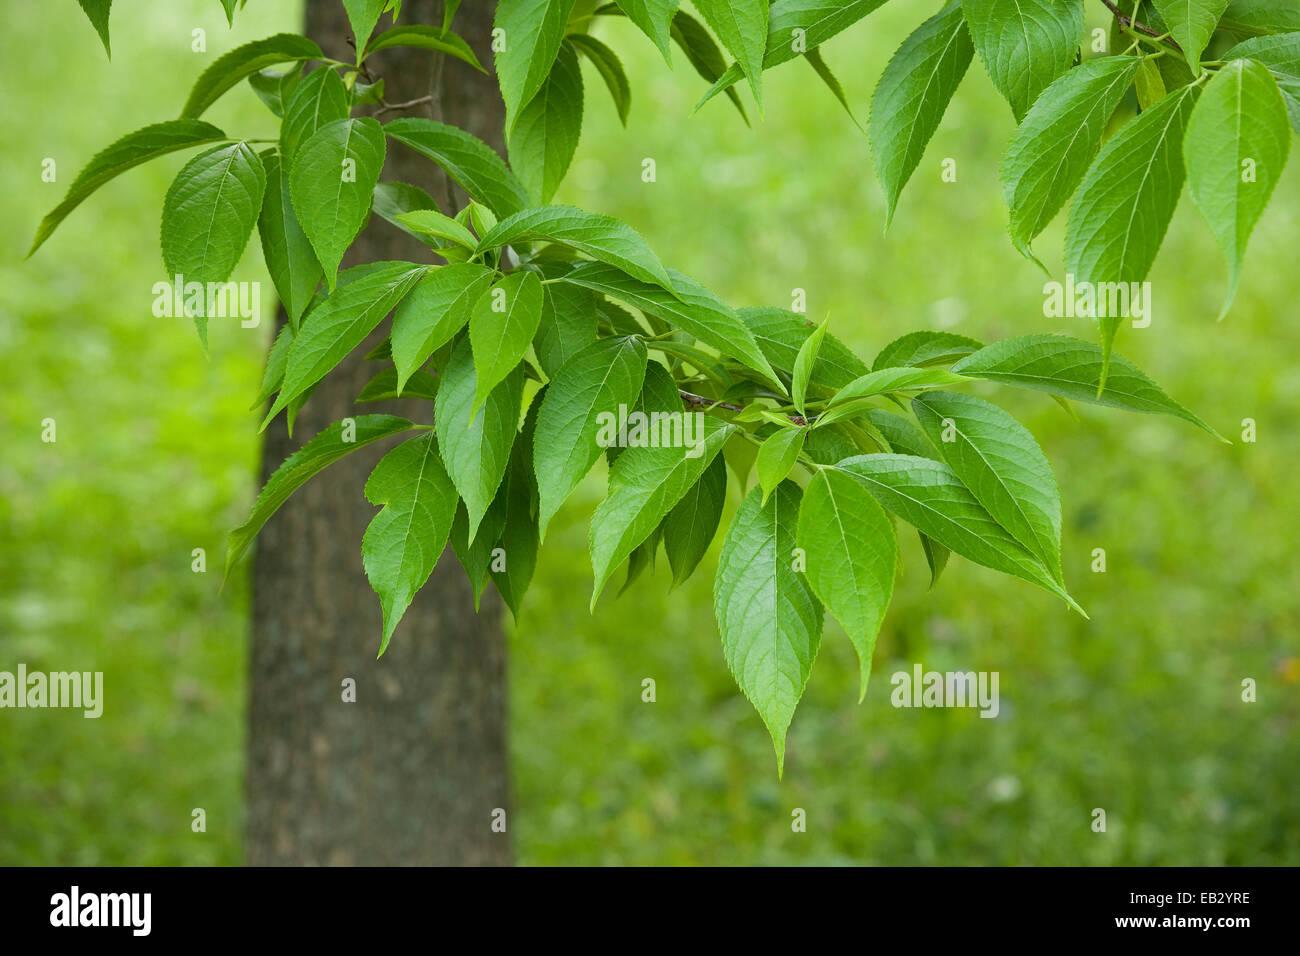 Hardy Rubber Tree Eucommia Ulmoides Leaves Native To